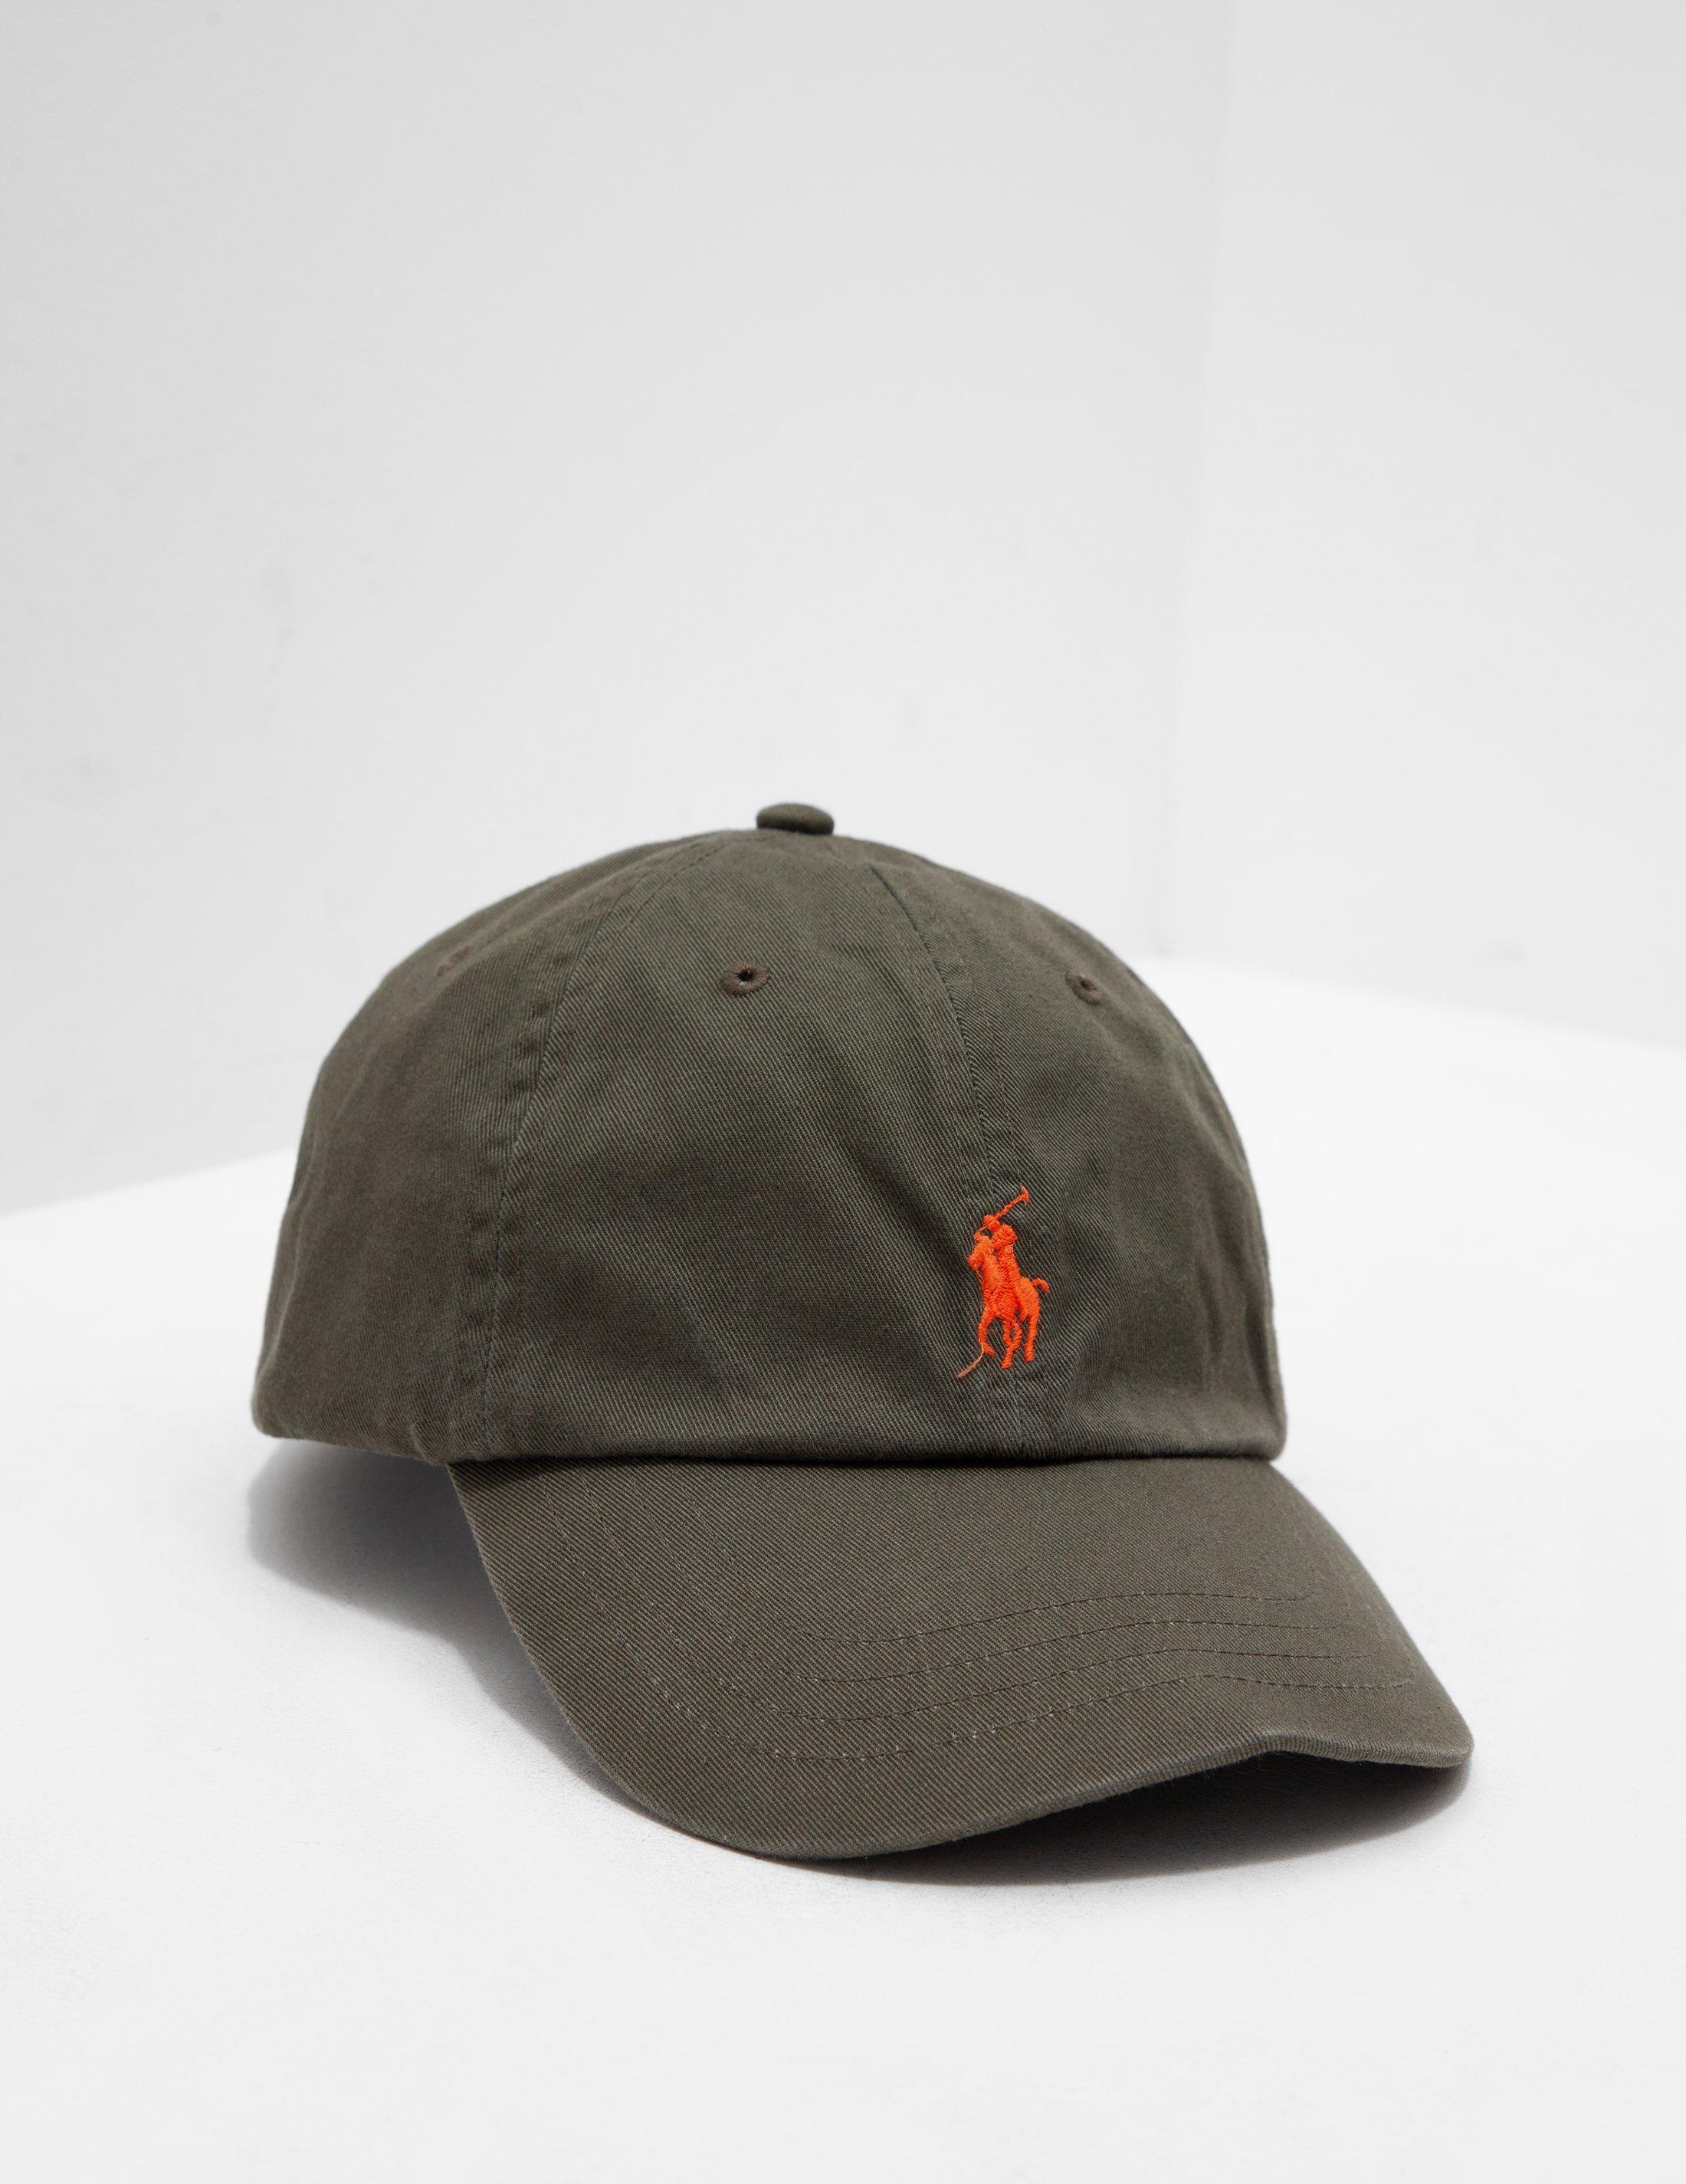 Polo Ralph Lauren - Mens Classic Cap Green for Men - Lyst. View fullscreen 1d97008ac577